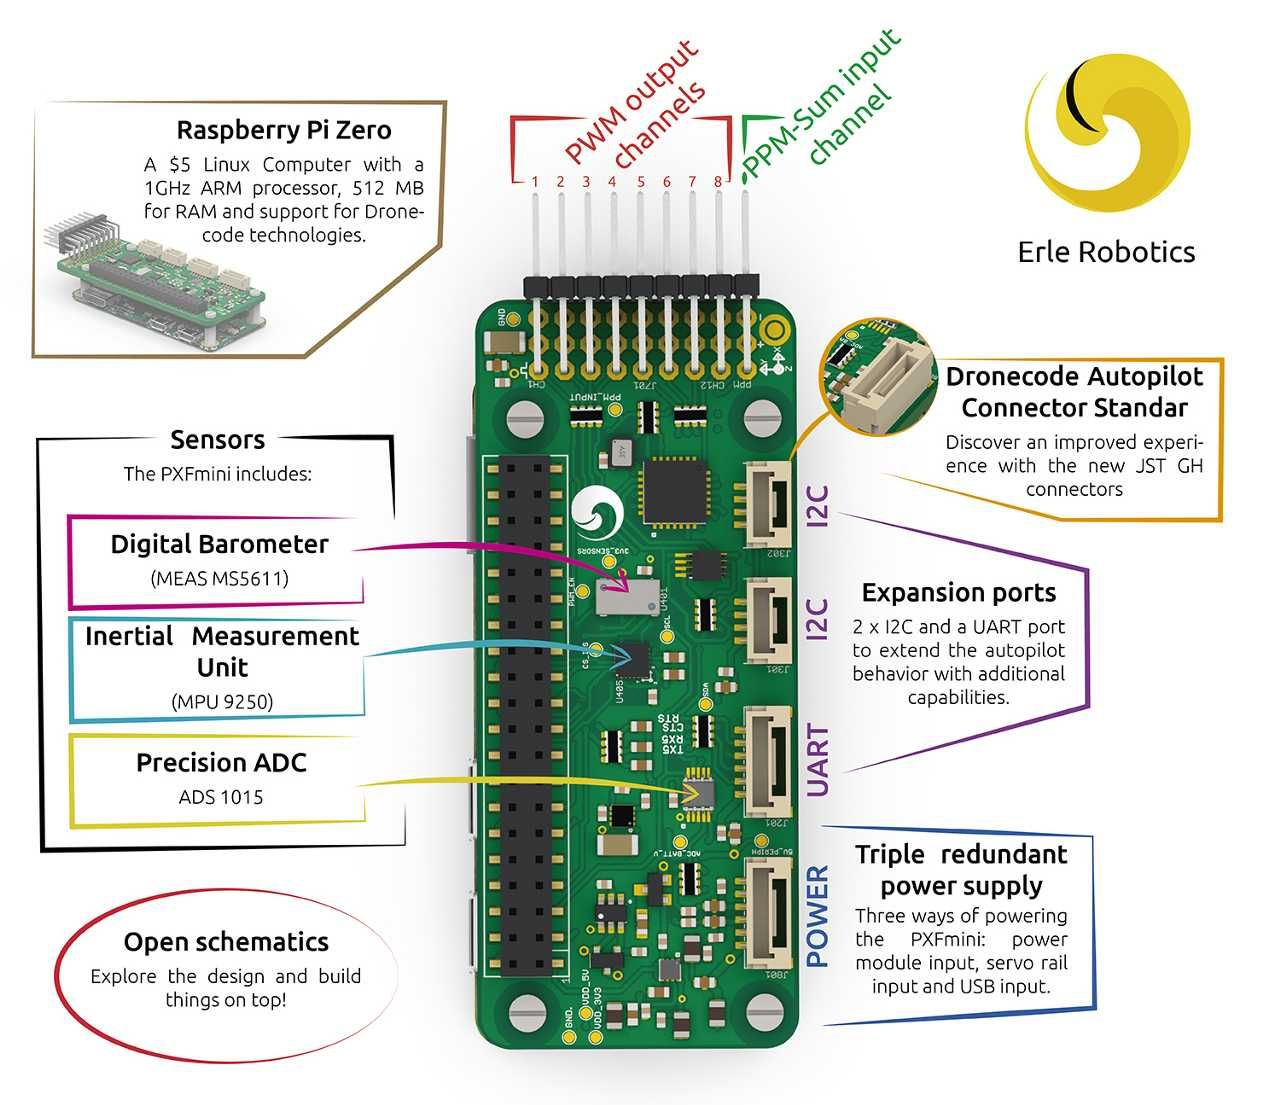 Raspberry pi zero a computer for 5 - Raspberry Pi Zero Quadrocopter